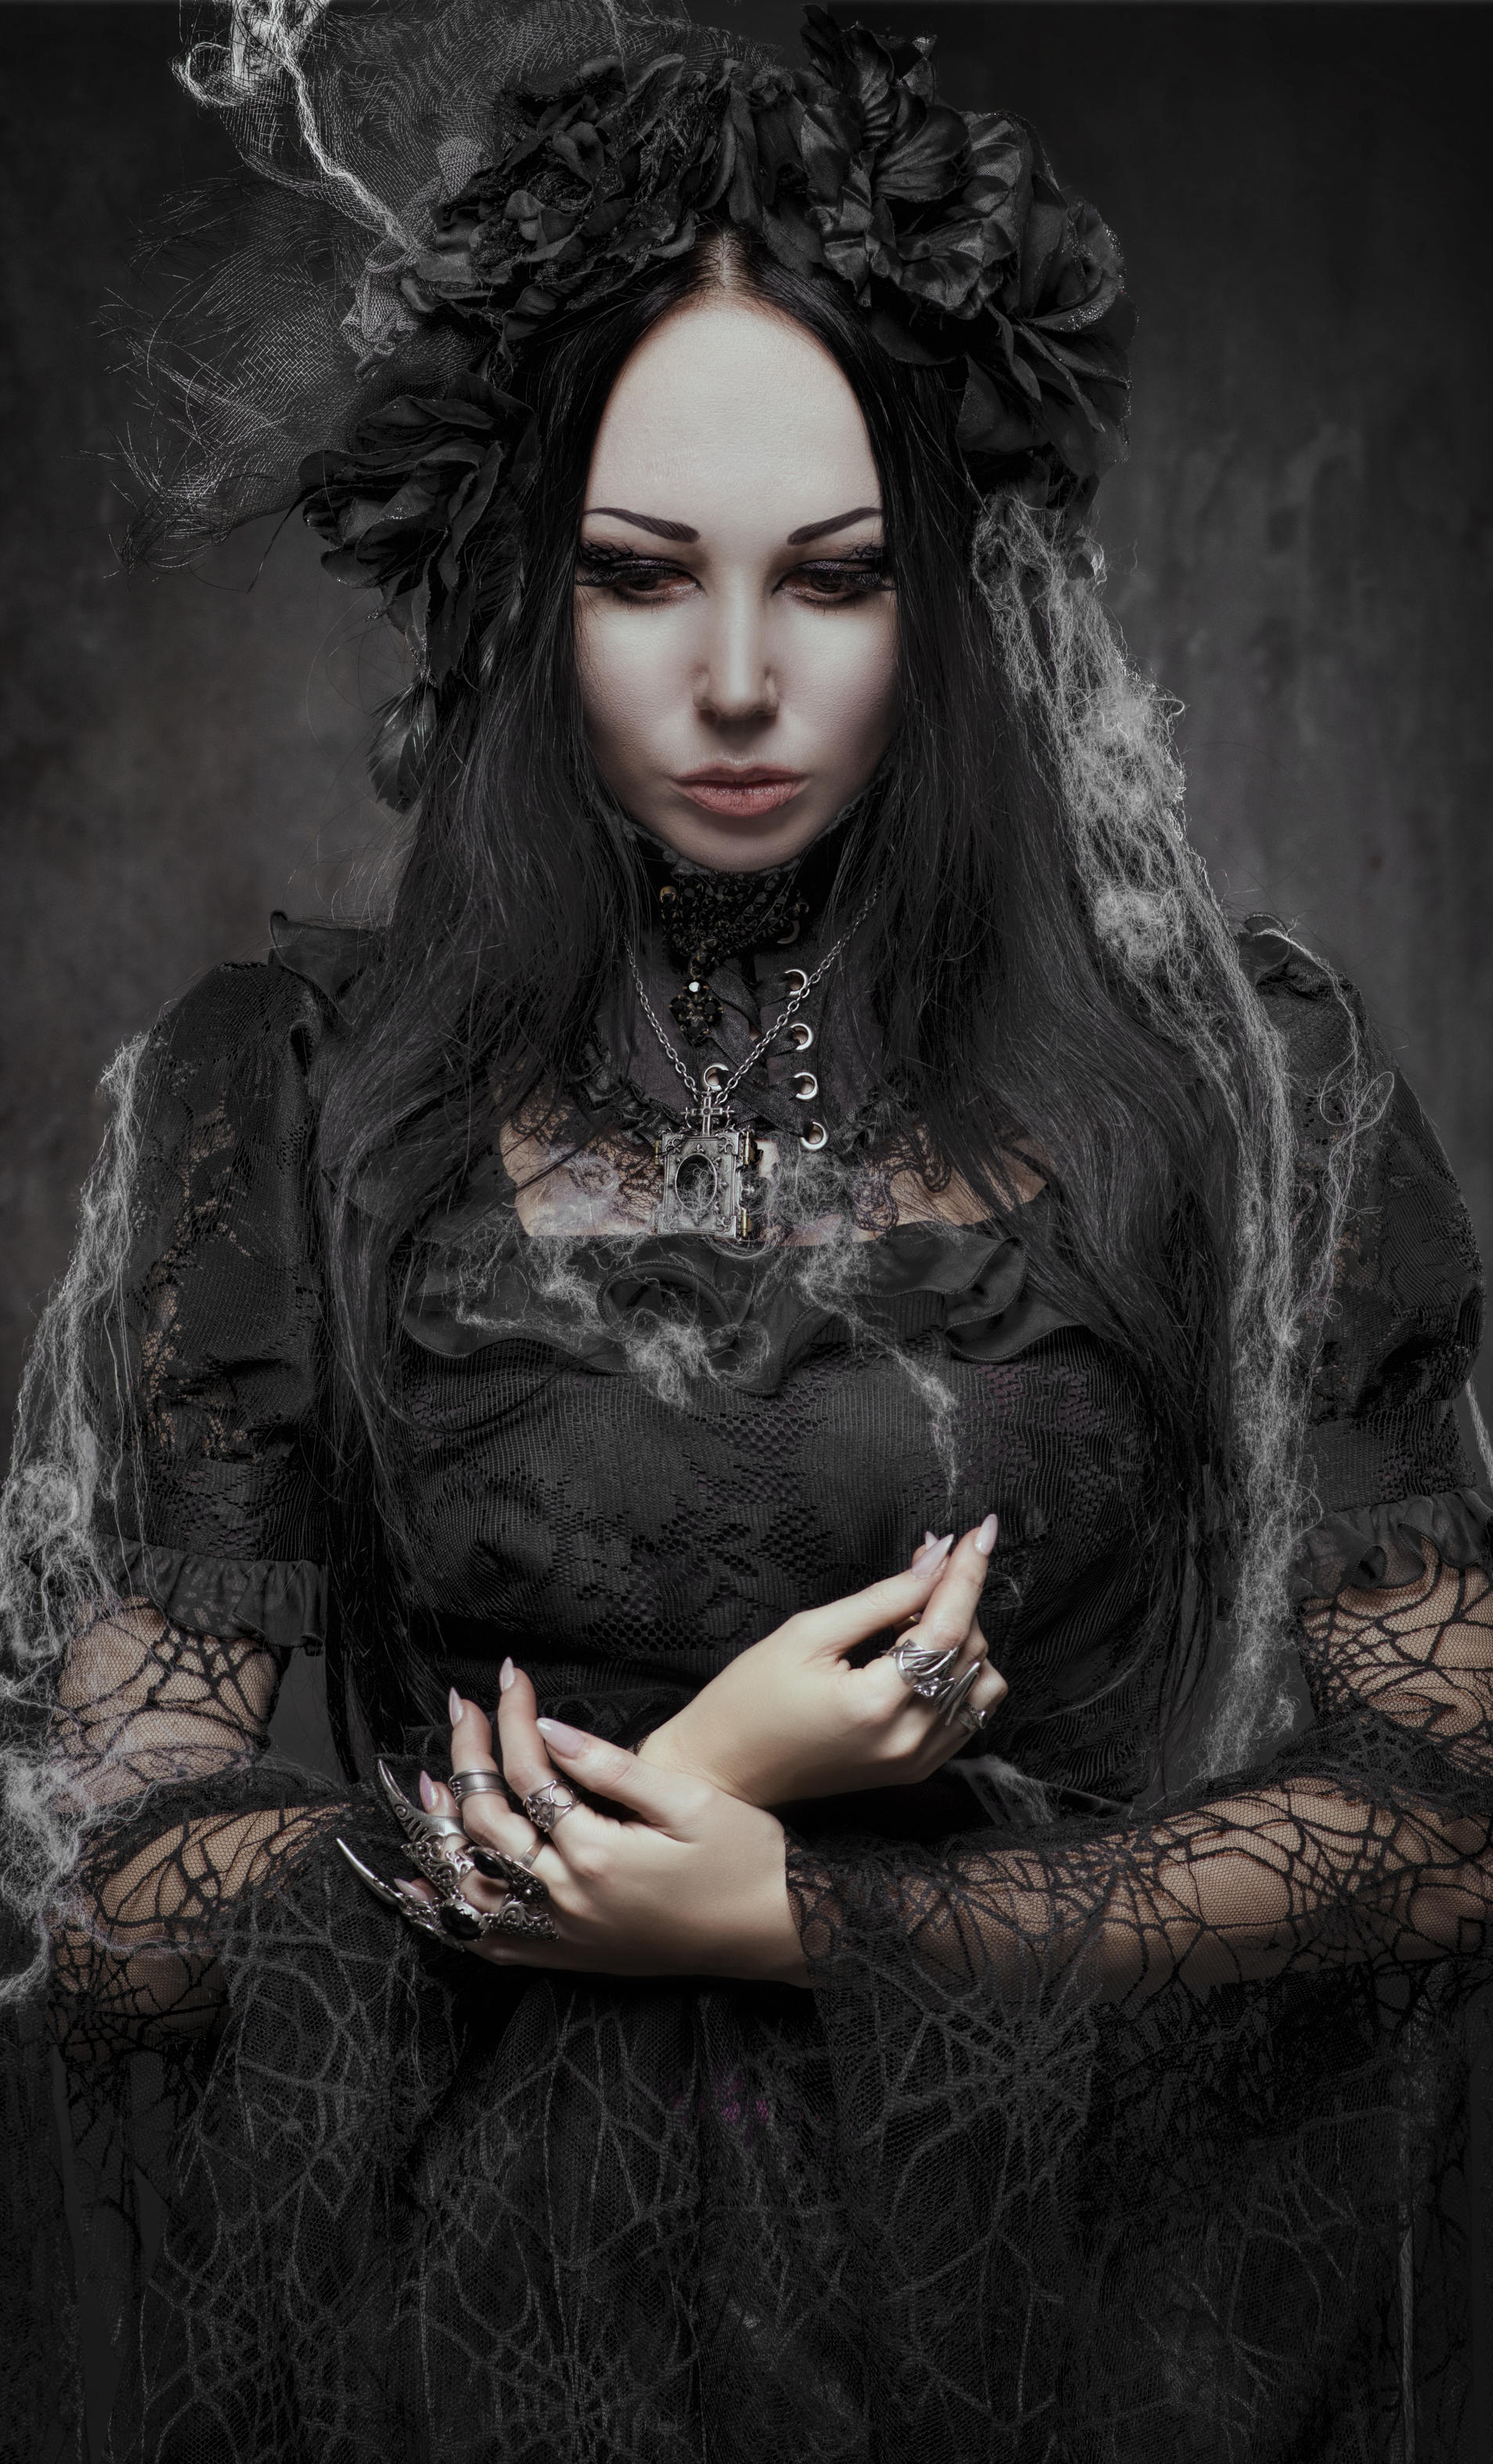 Gothic woman in dark 4 by bouzid27